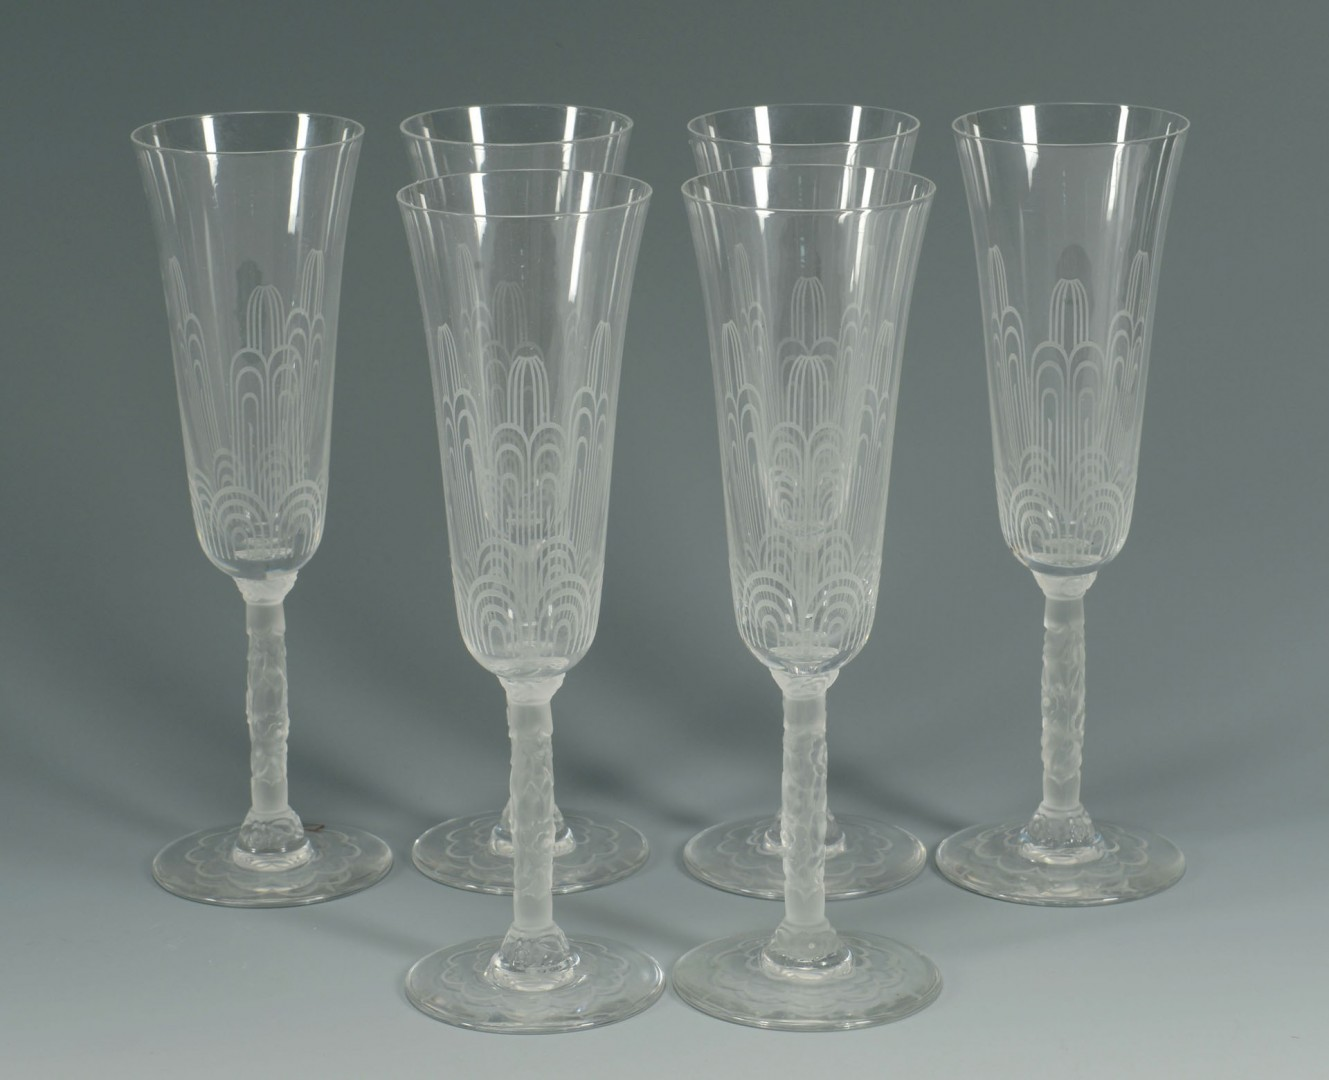 Set of 6 Baccarat Crystal Champagne Glasses